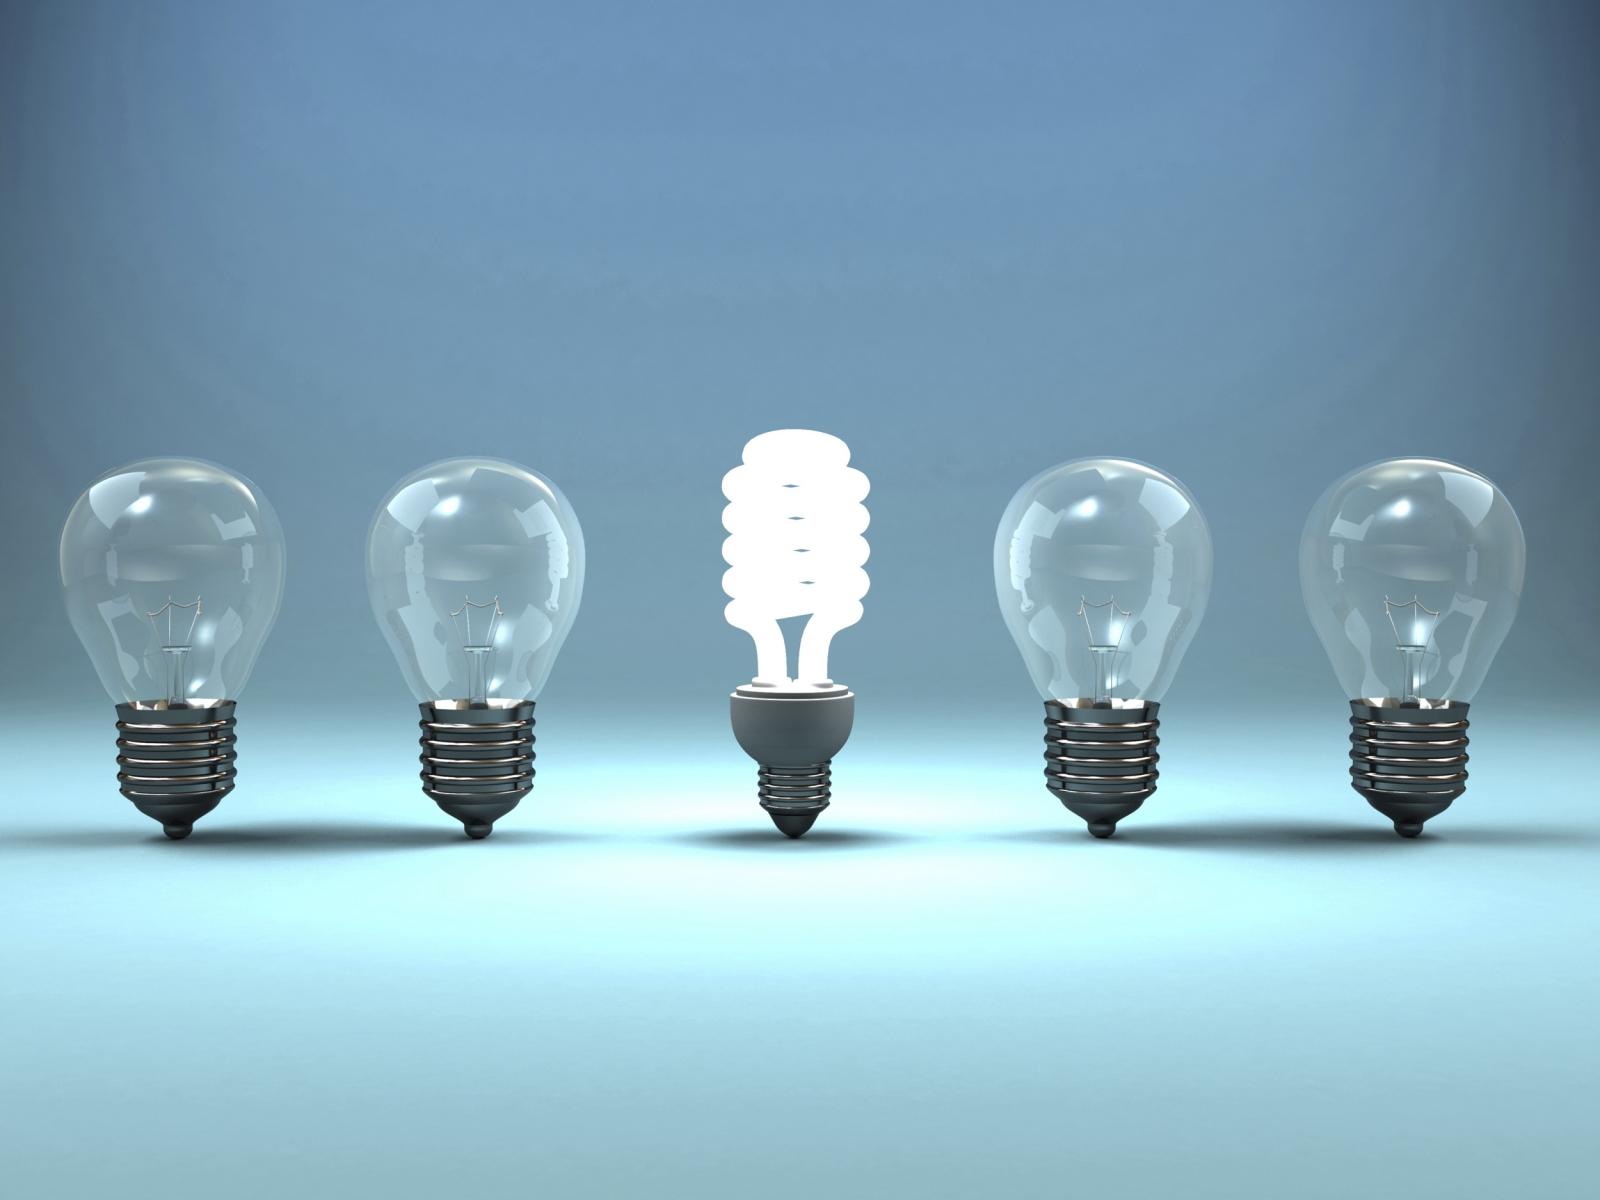 bombita-luz-subsidios